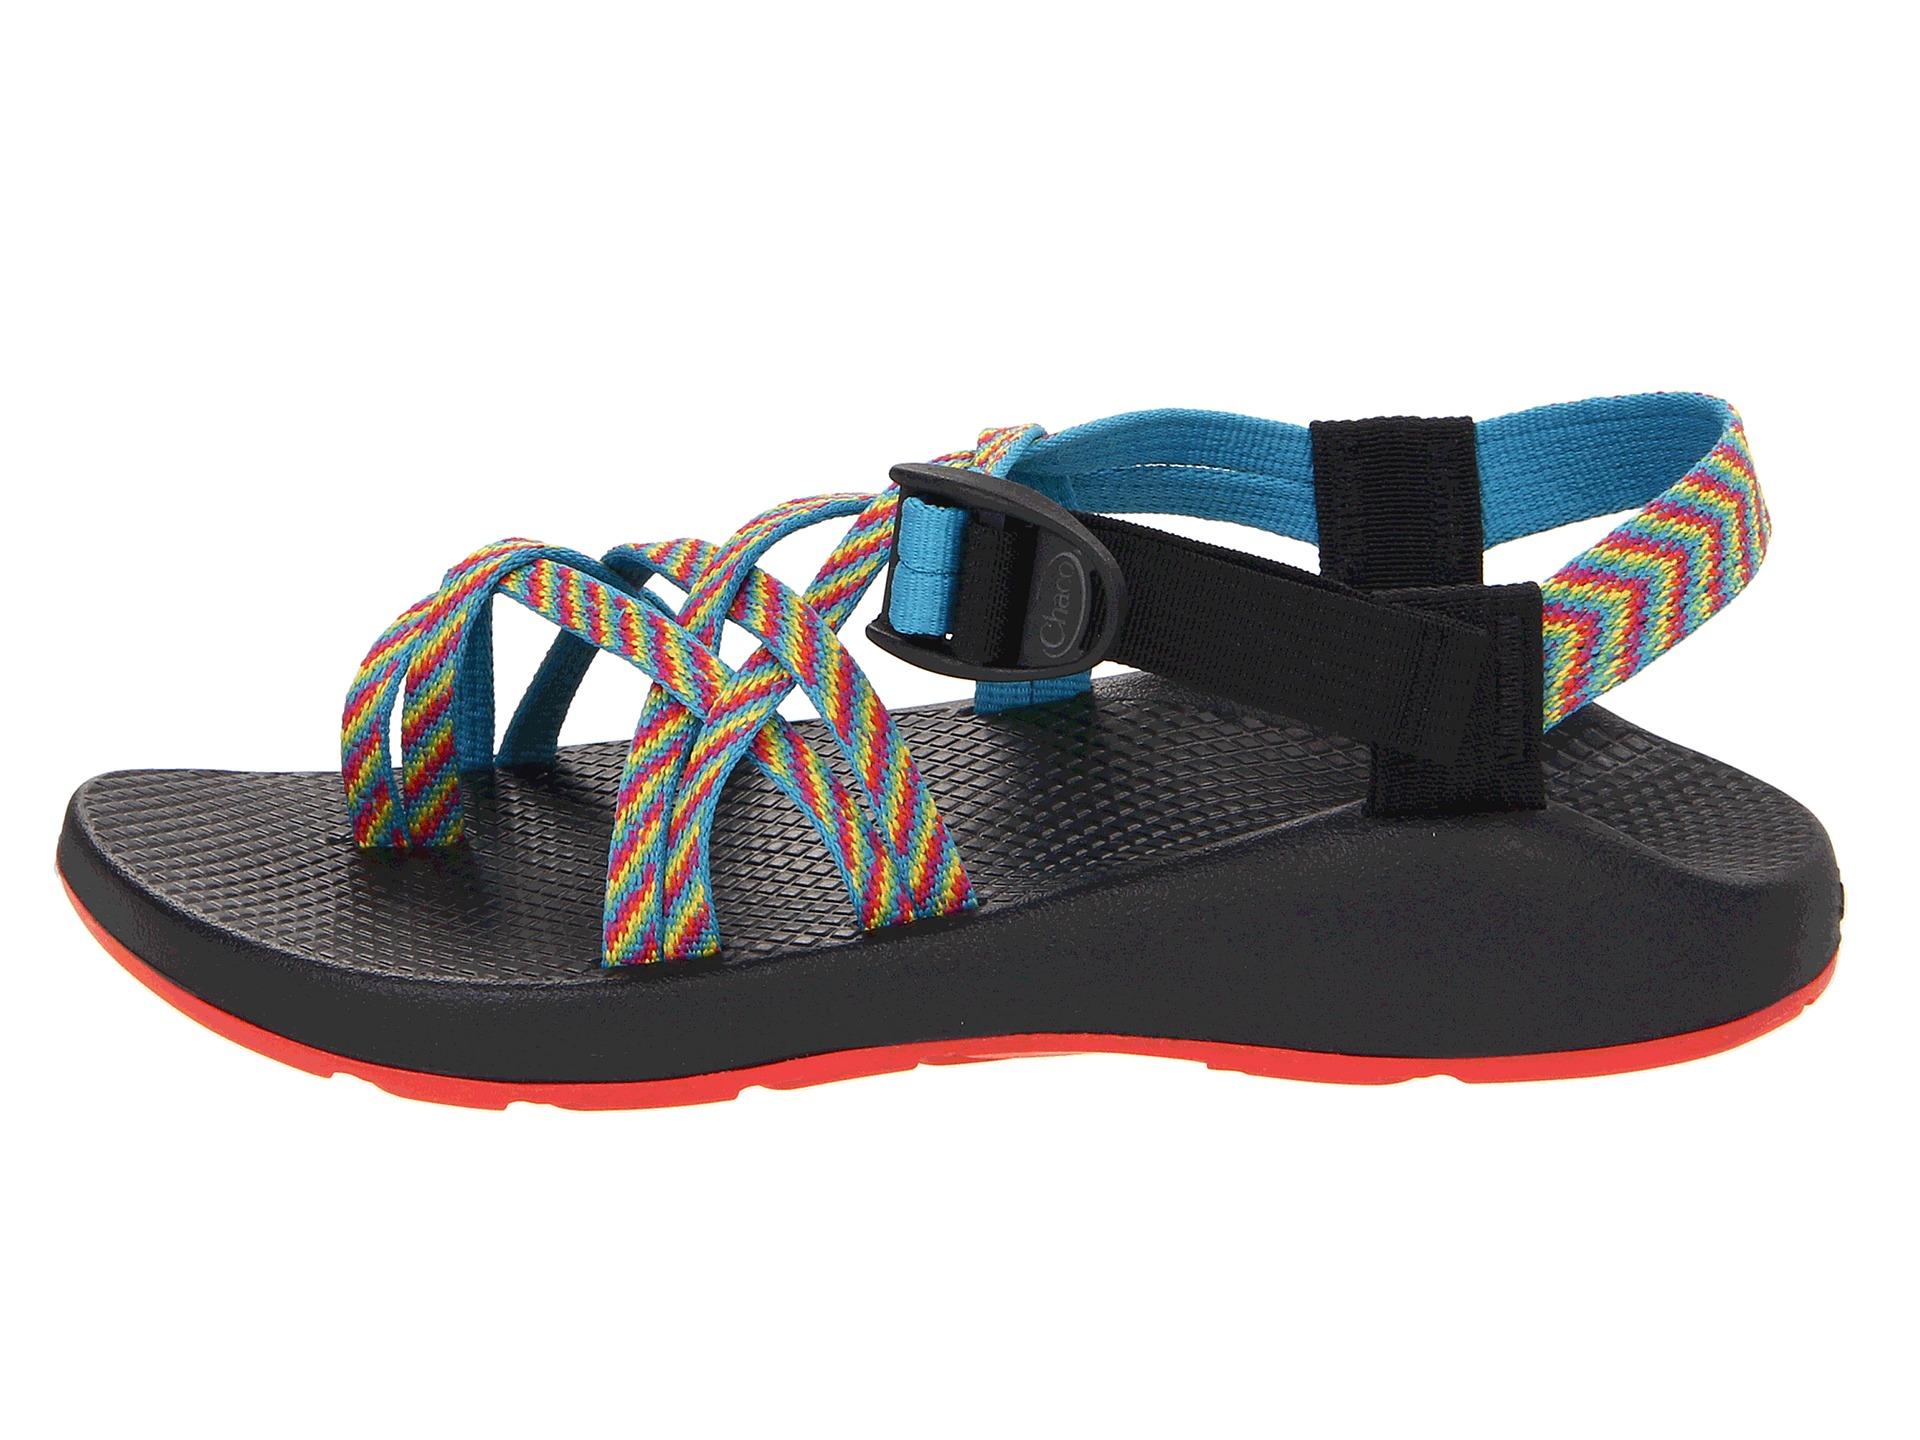 Kids Shoe Chaco Toe